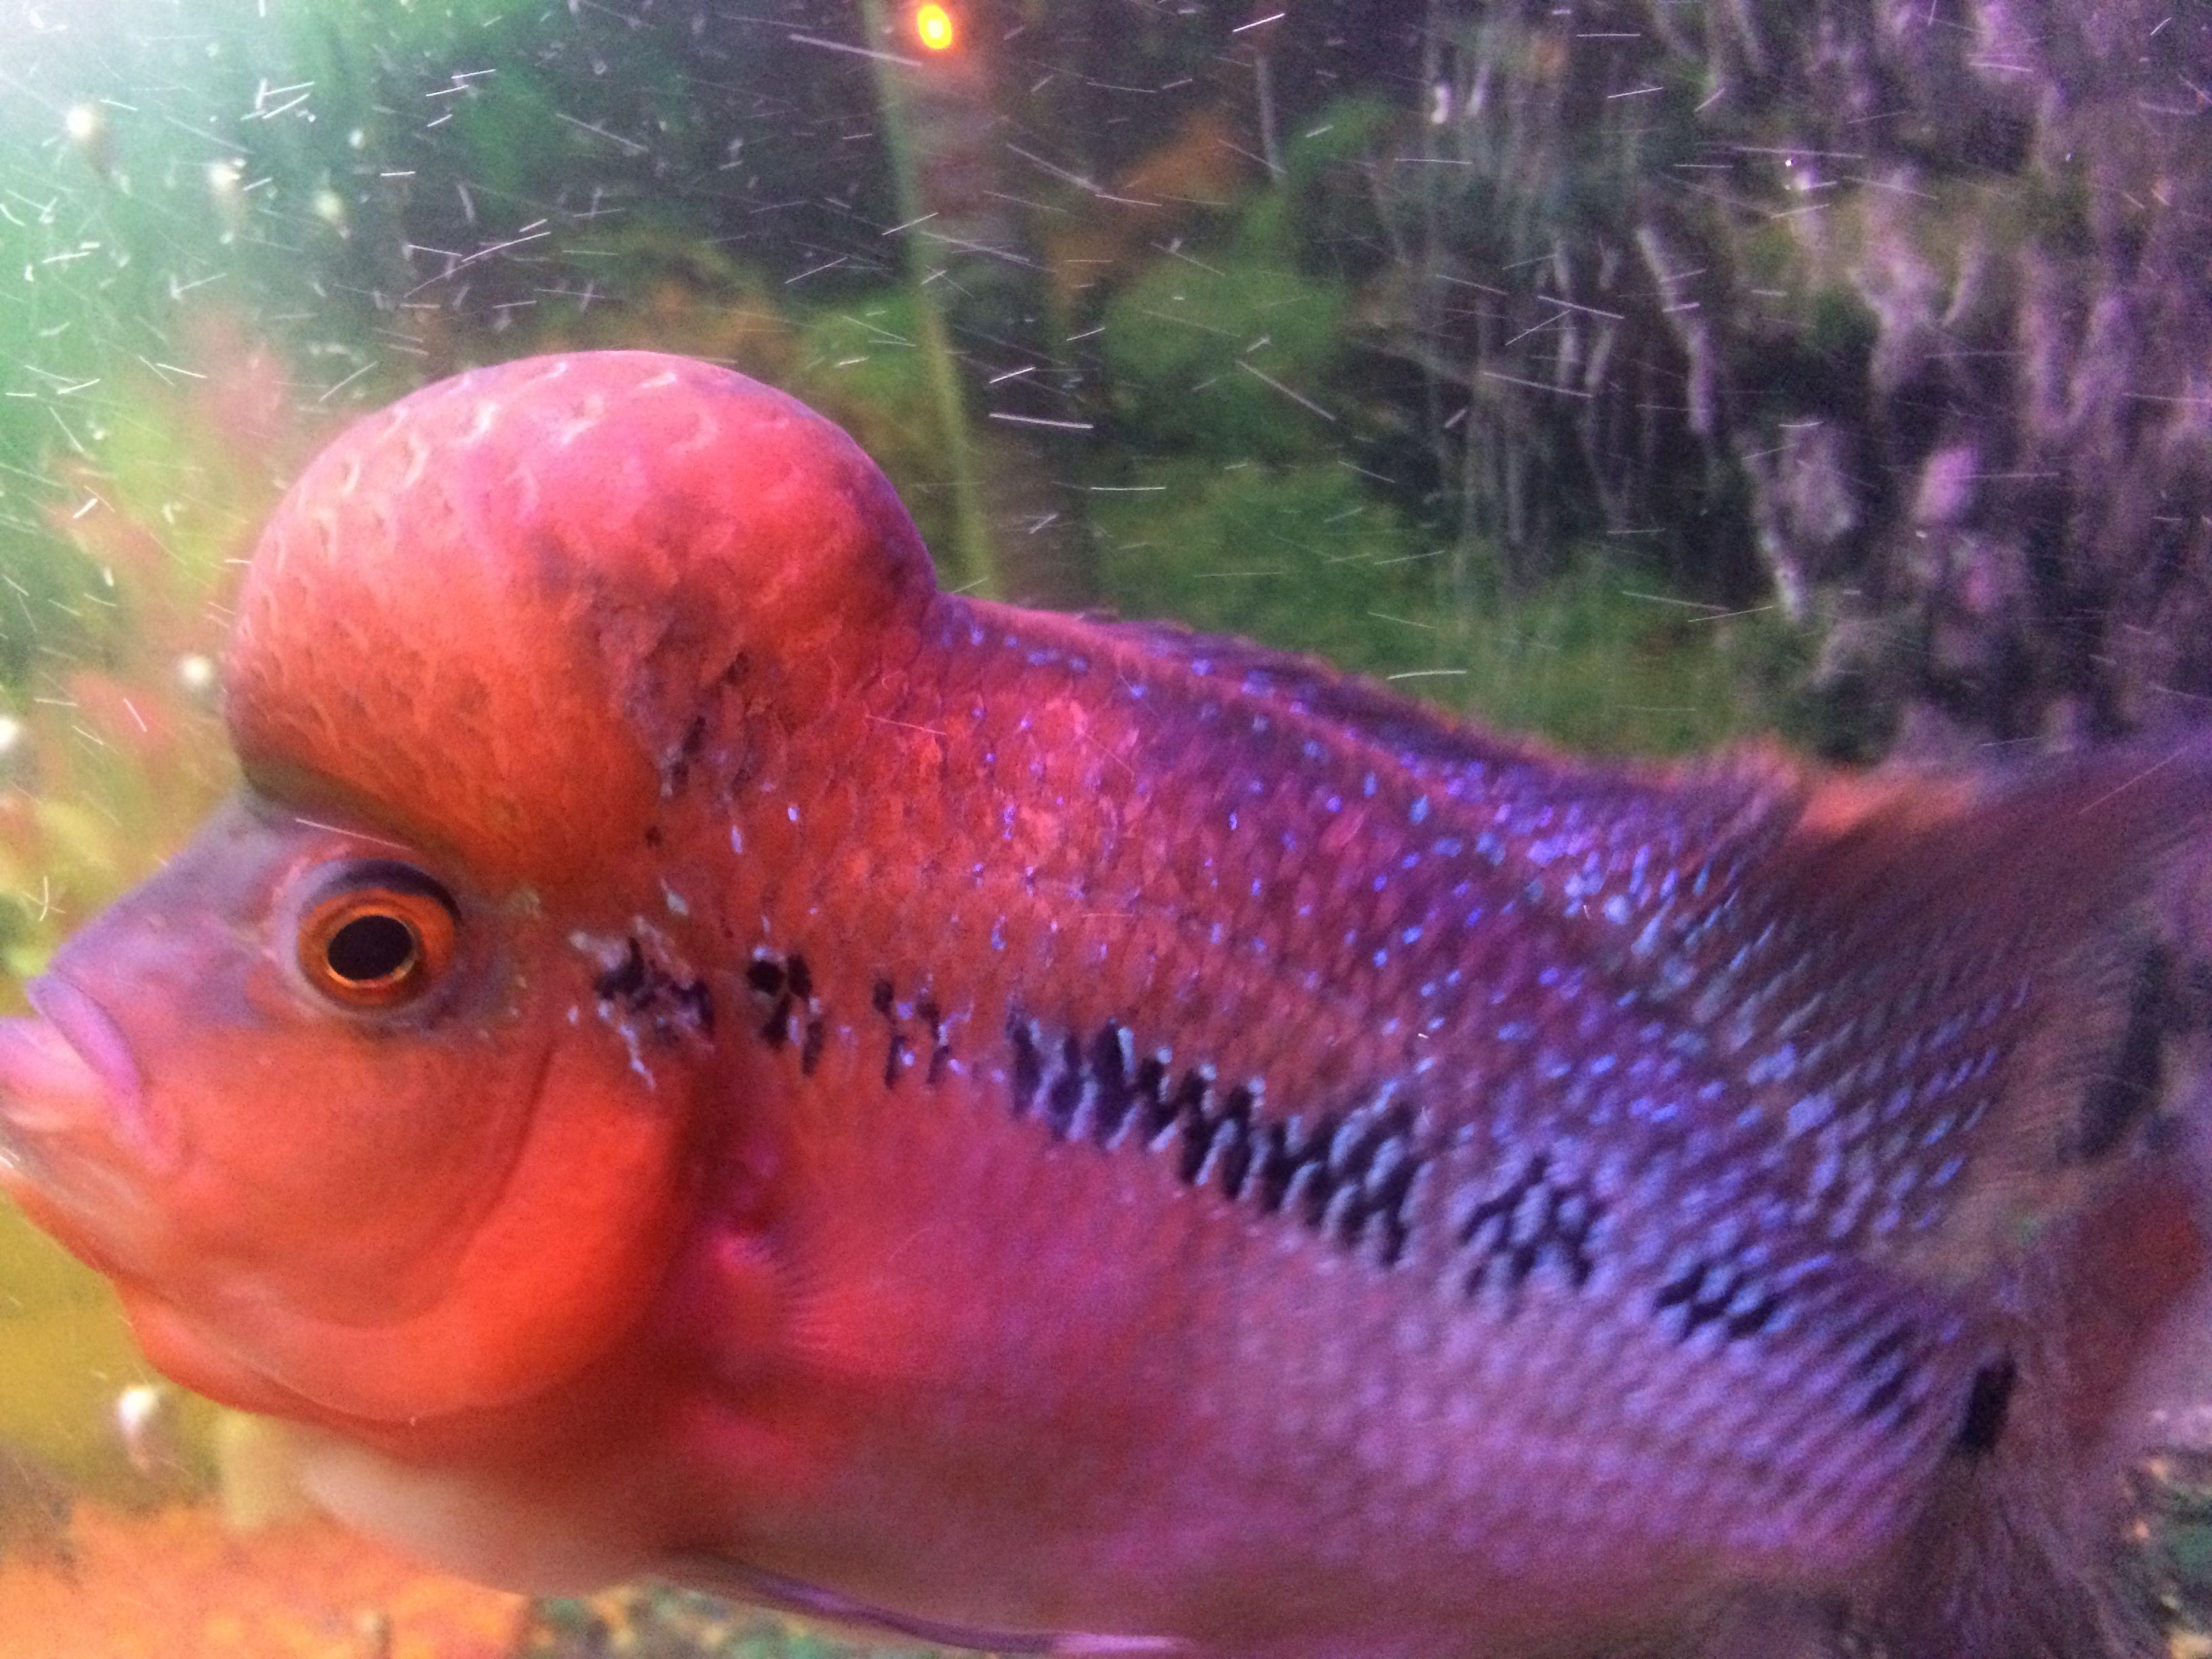 Flowerhorn Fish | Freshwater Aquarium & Fishes | Pinterest ...